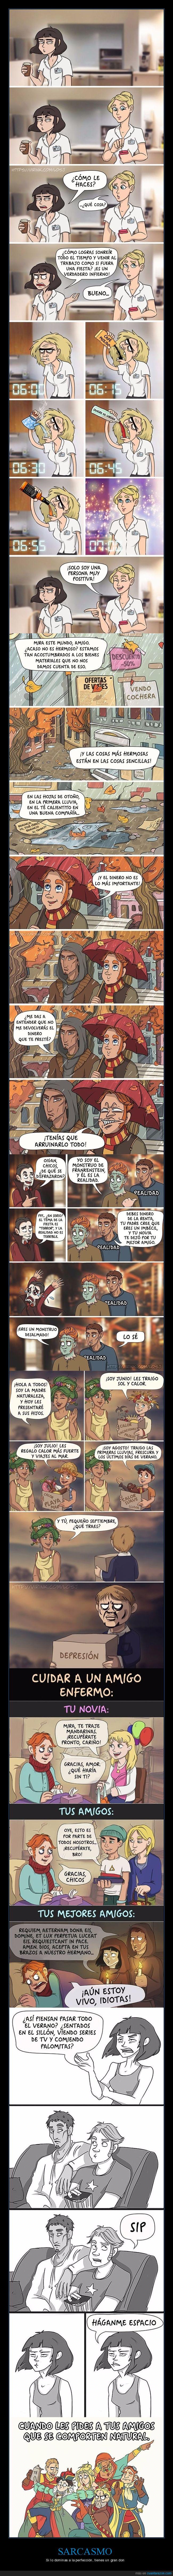 cómics,ironía,sarcasmo